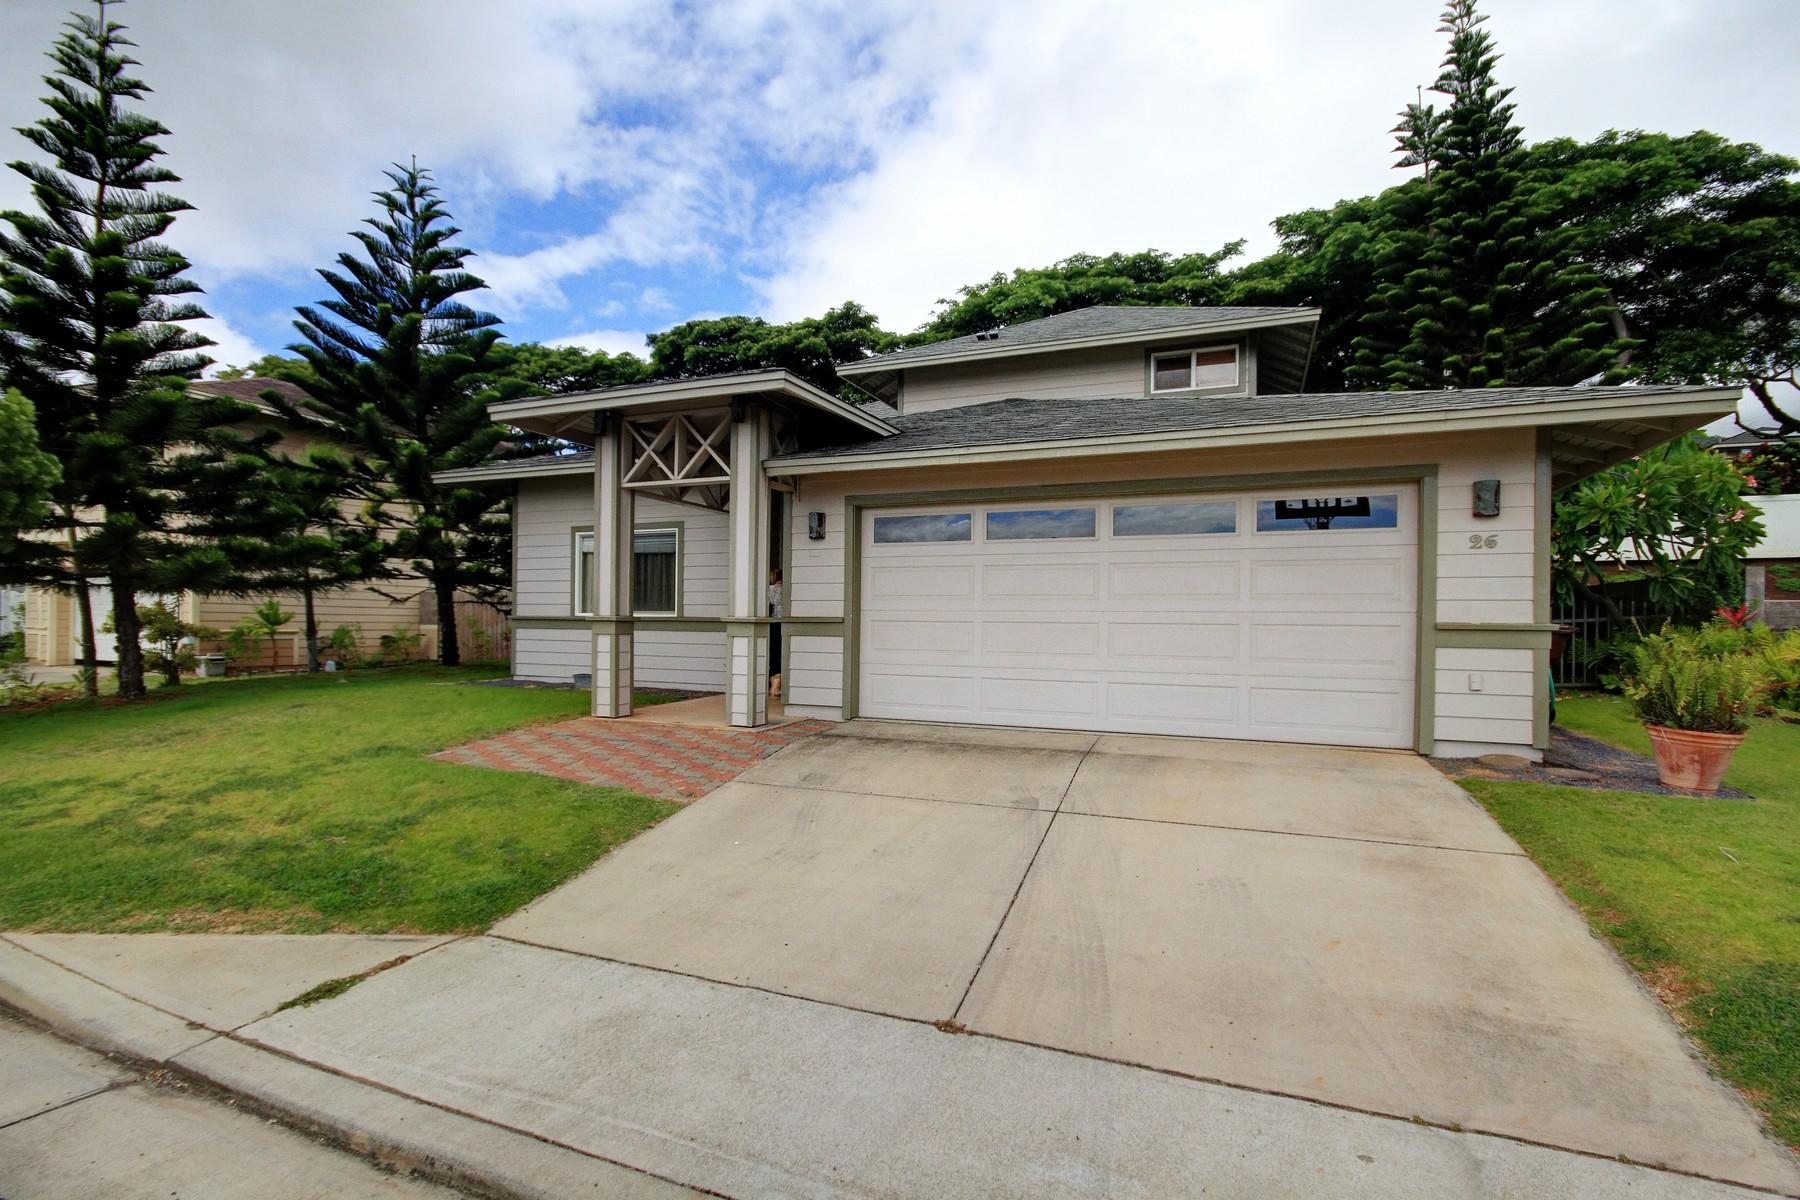 Maison unifamiliale pour l Vente à Home Sweet Home 26 Kolopua Place Wailuku, Hawaii 96793 États-Unis